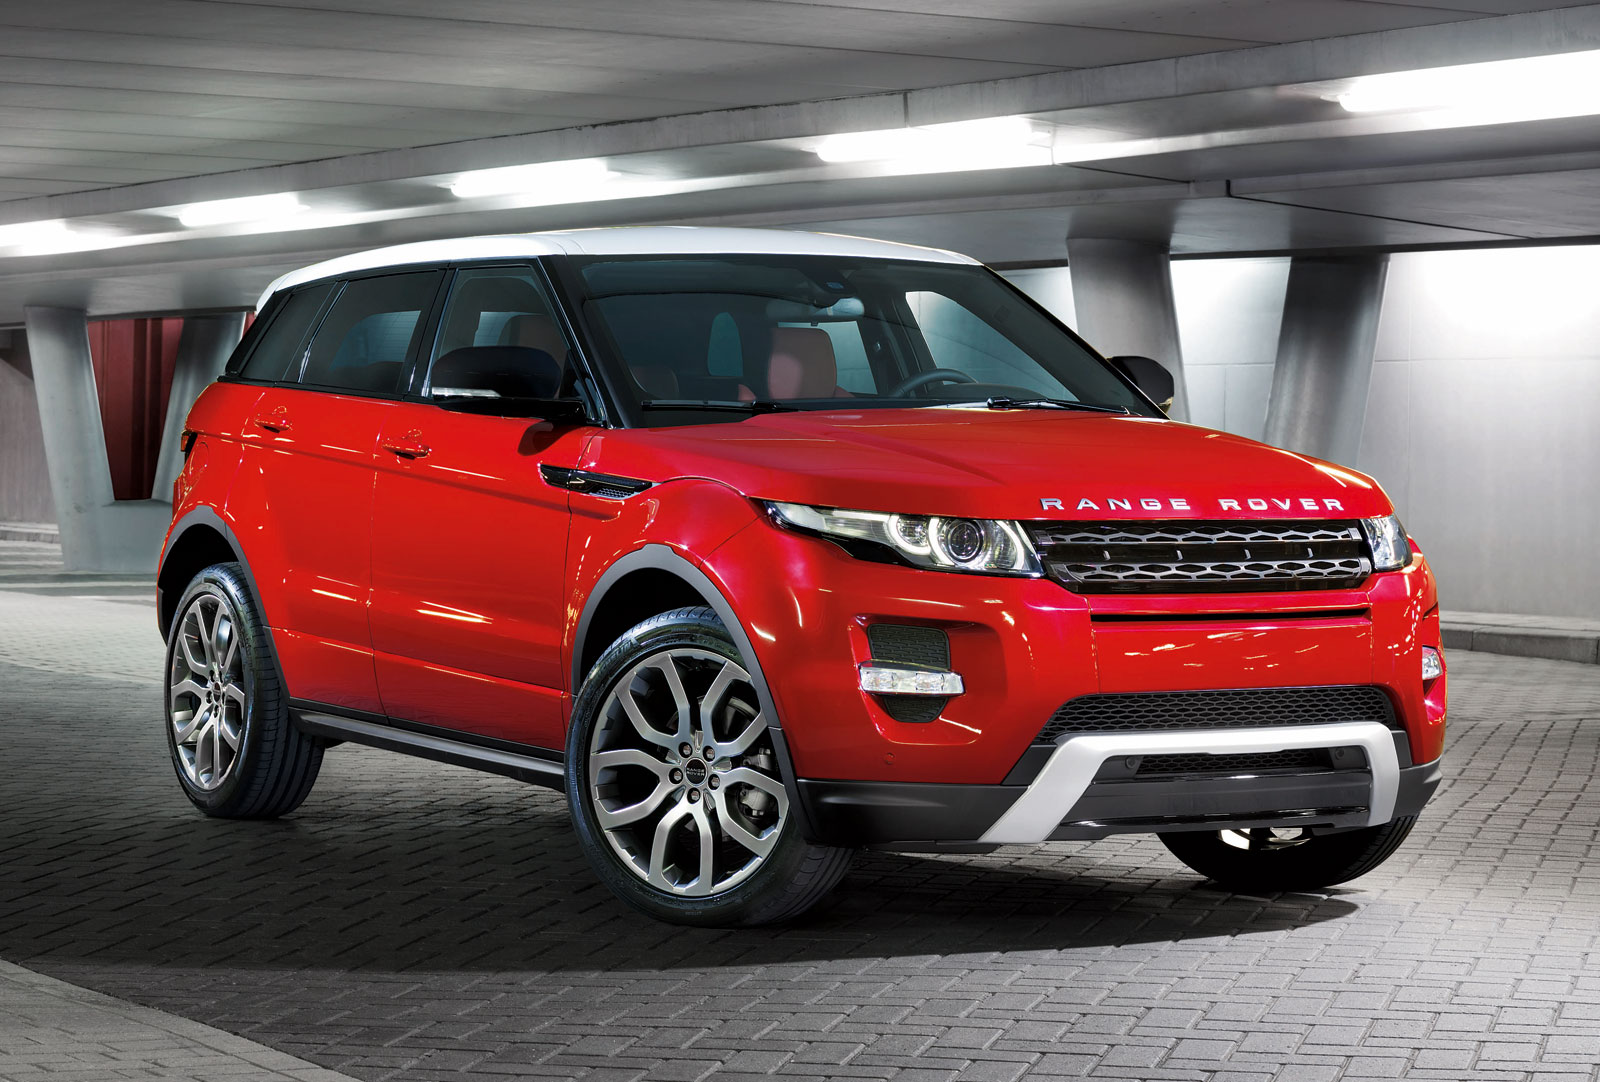 2015 land rover range rover evoque 19 widescreen car wallpaper. Black Bedroom Furniture Sets. Home Design Ideas